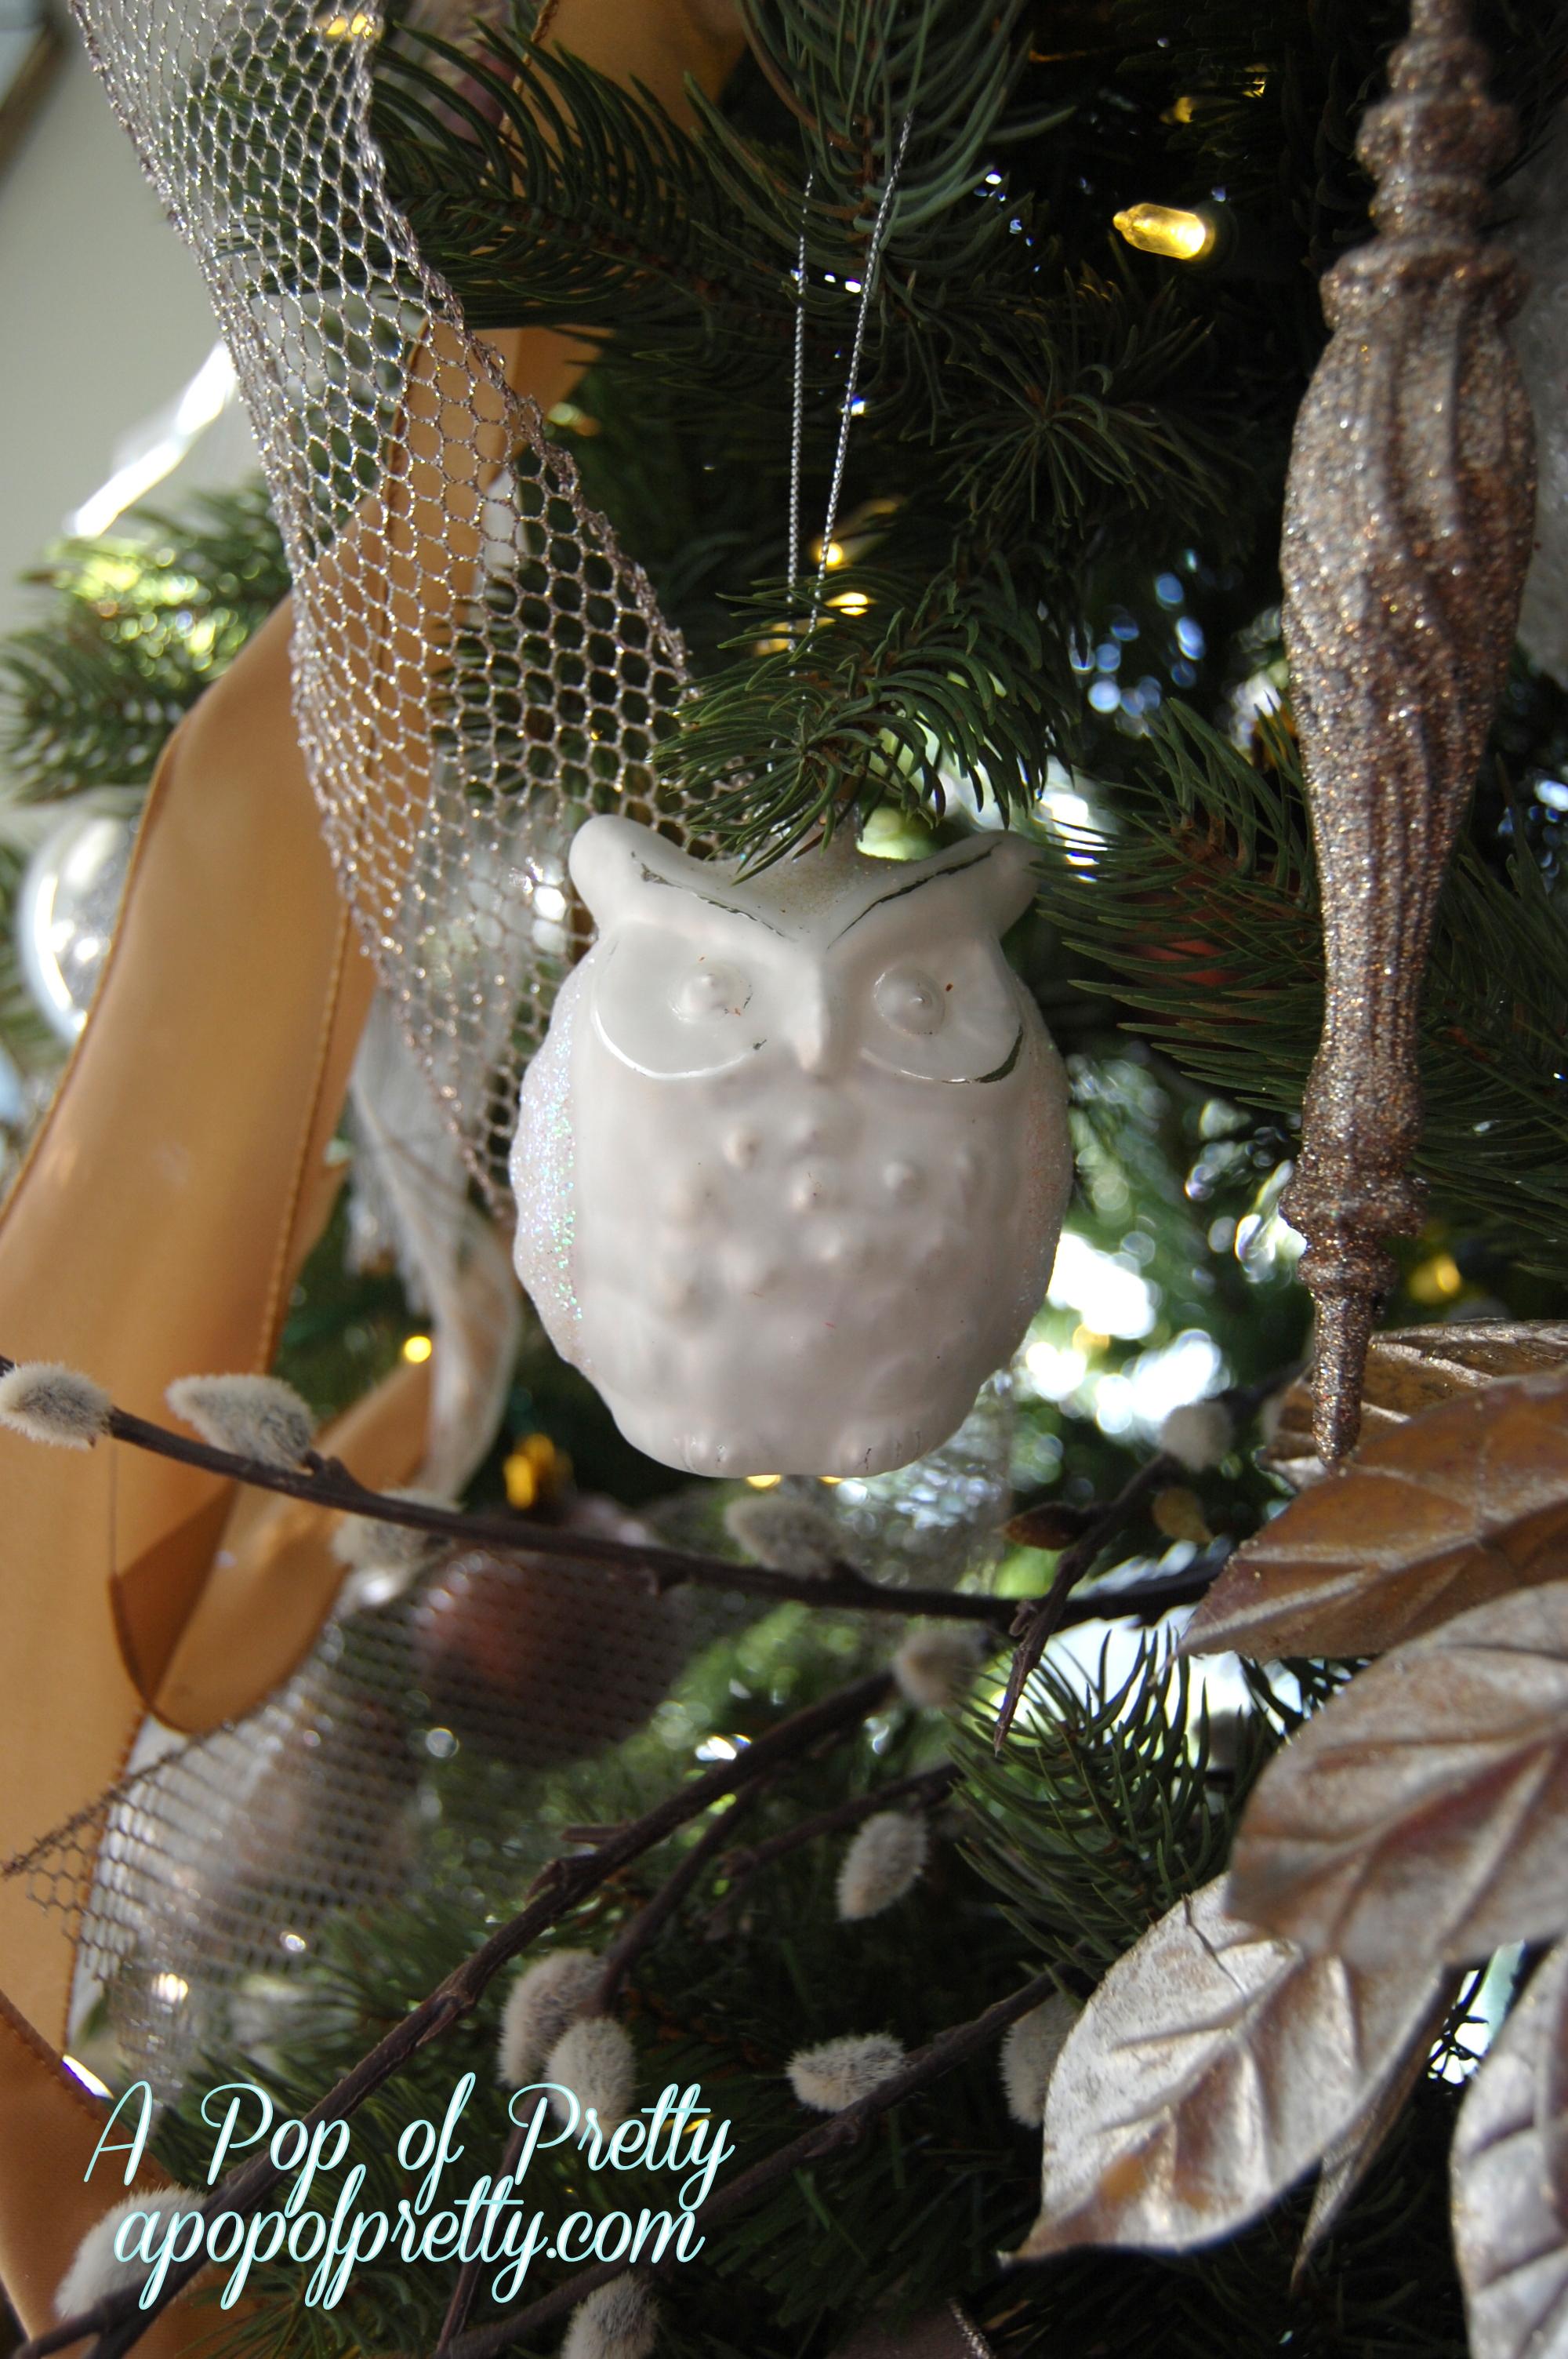 Owl Christmas tree decor - A Pop of Pretty: Canadian Decorating Blog ...